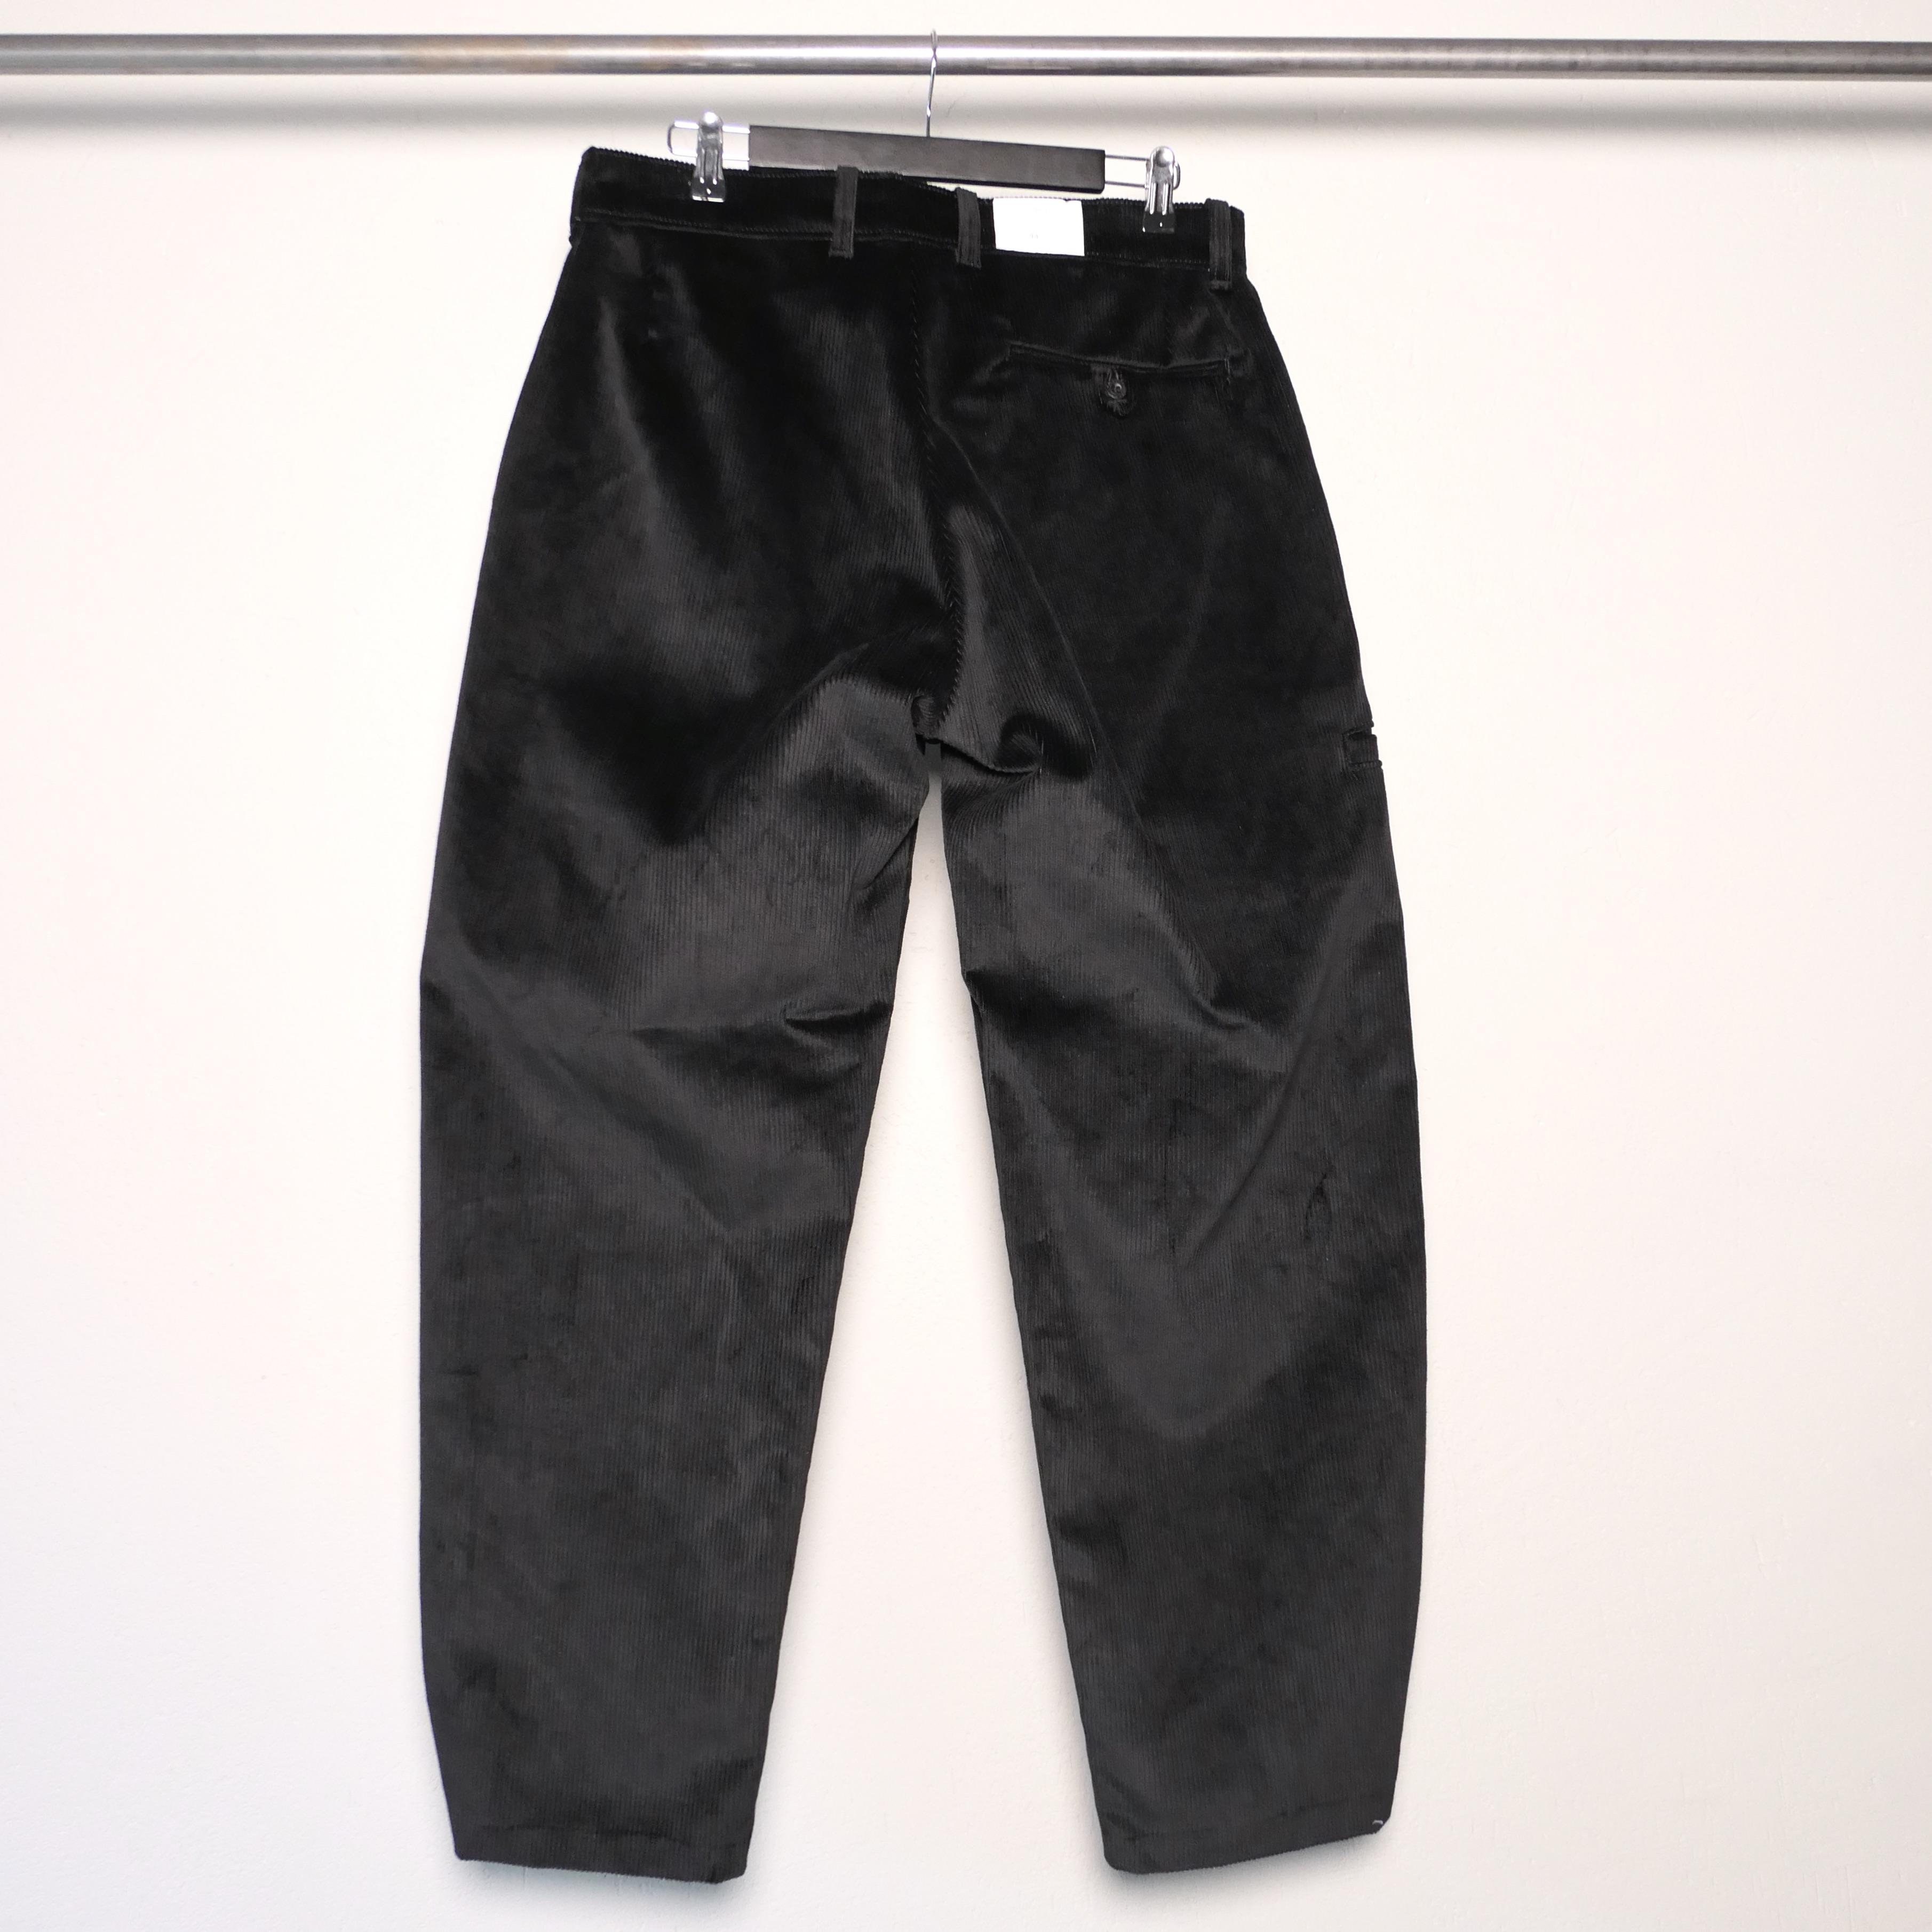 Corduroy Craftsman pants black